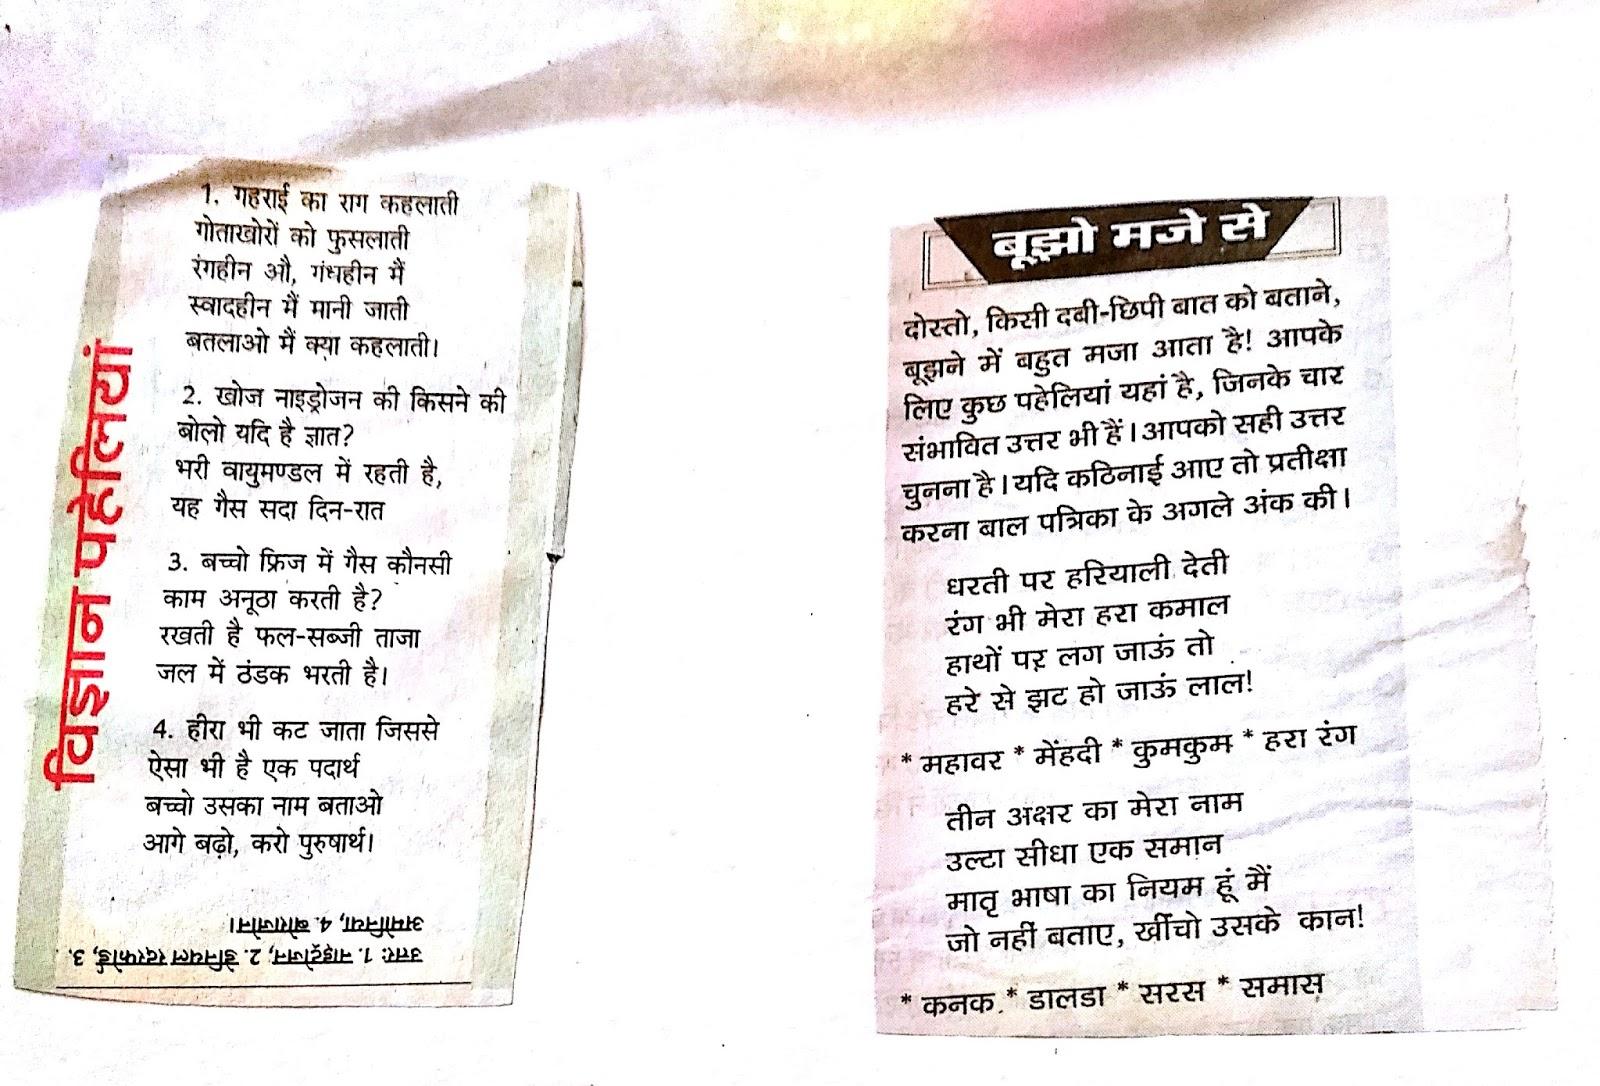 Hindi Grammar Work Sheet Collection For Classes 5 6 7 Amp 8 Collection Of Riddles For Classes 3